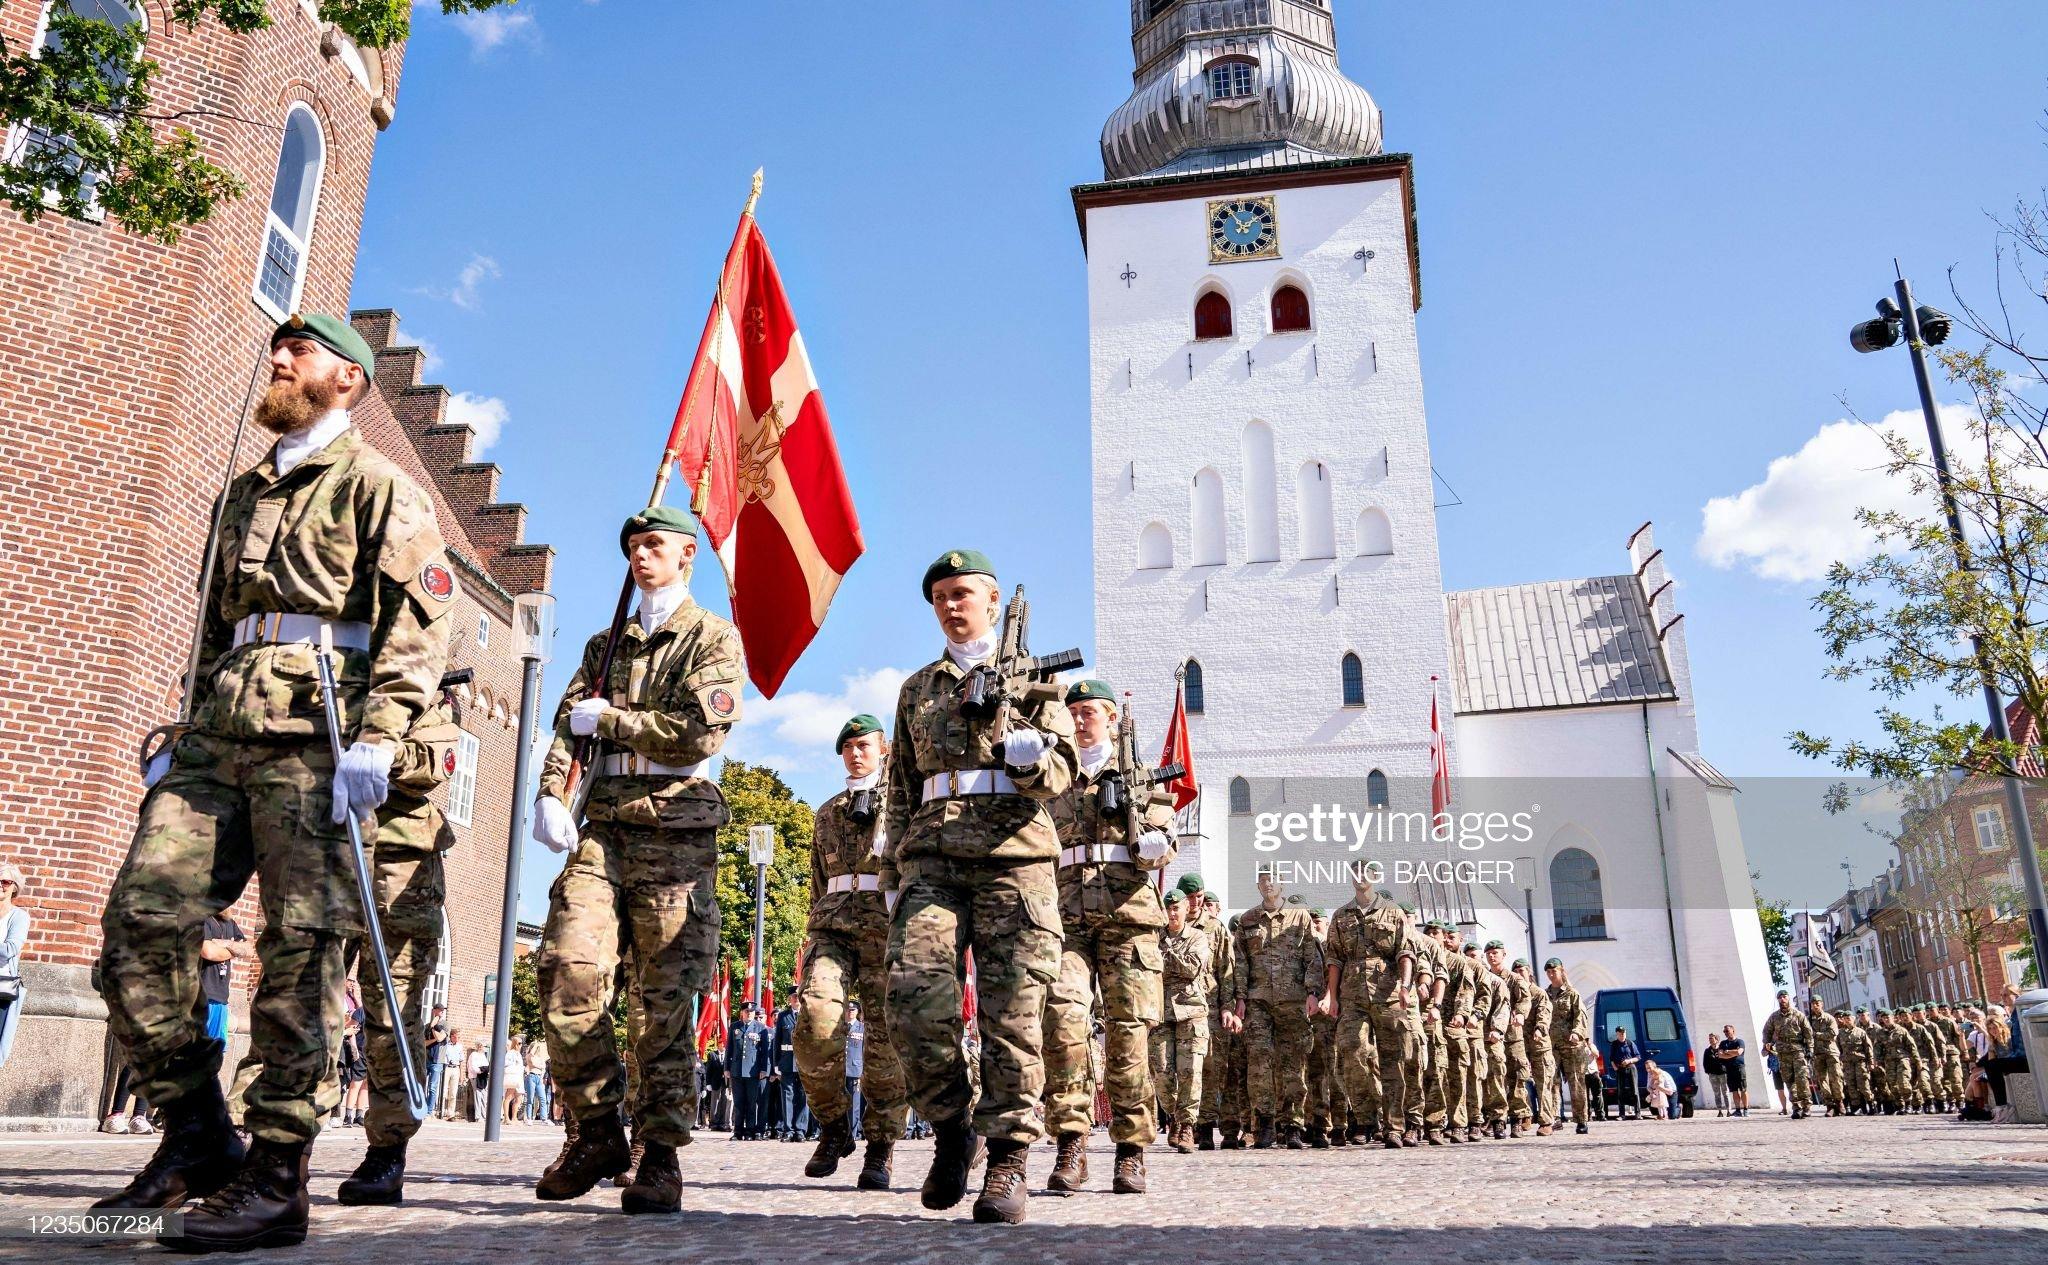 DENMARK-ROYALS-FLAG DAY : News Photo